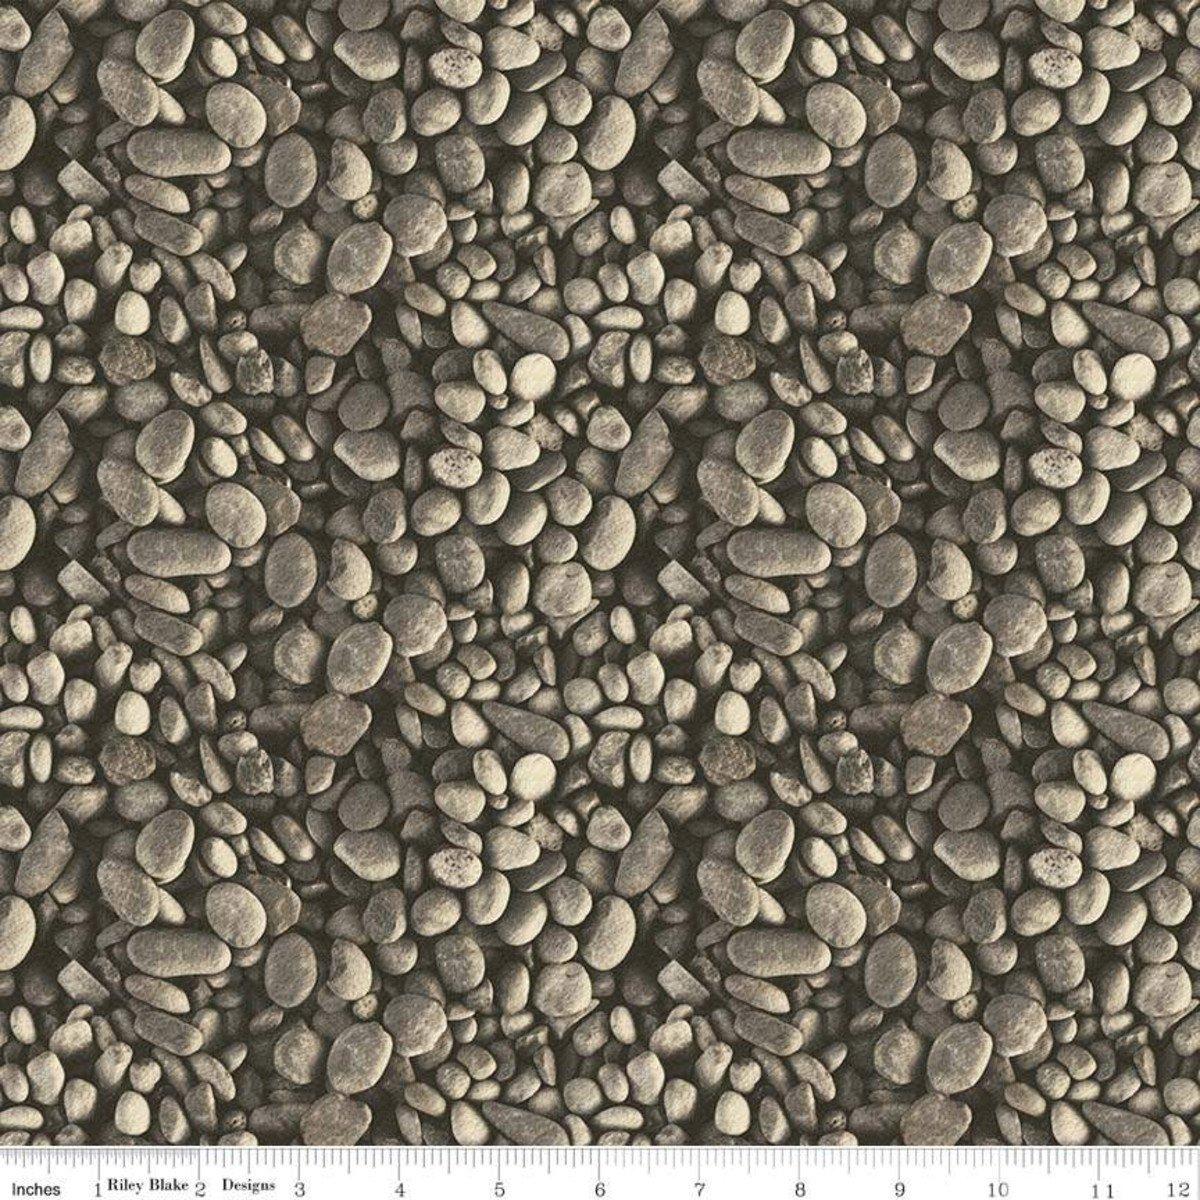 Brown Pebbles - Fish and Fowl - C8732-BROWN